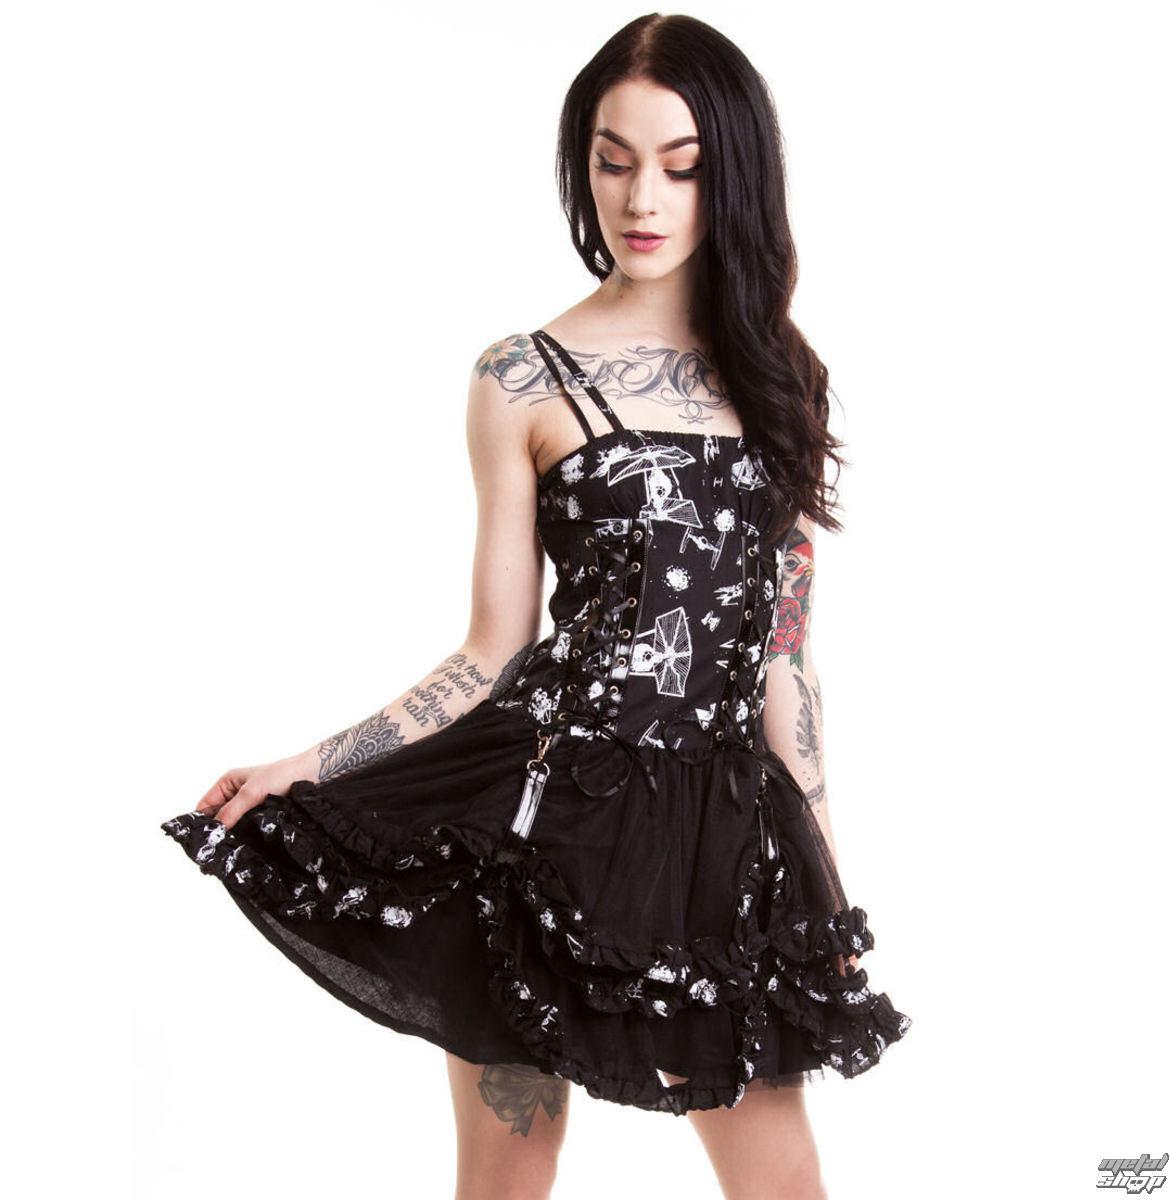 d092a519a šaty dámske DISNEY - Galaxy Empire - Black - POI101 - metalshop.sk